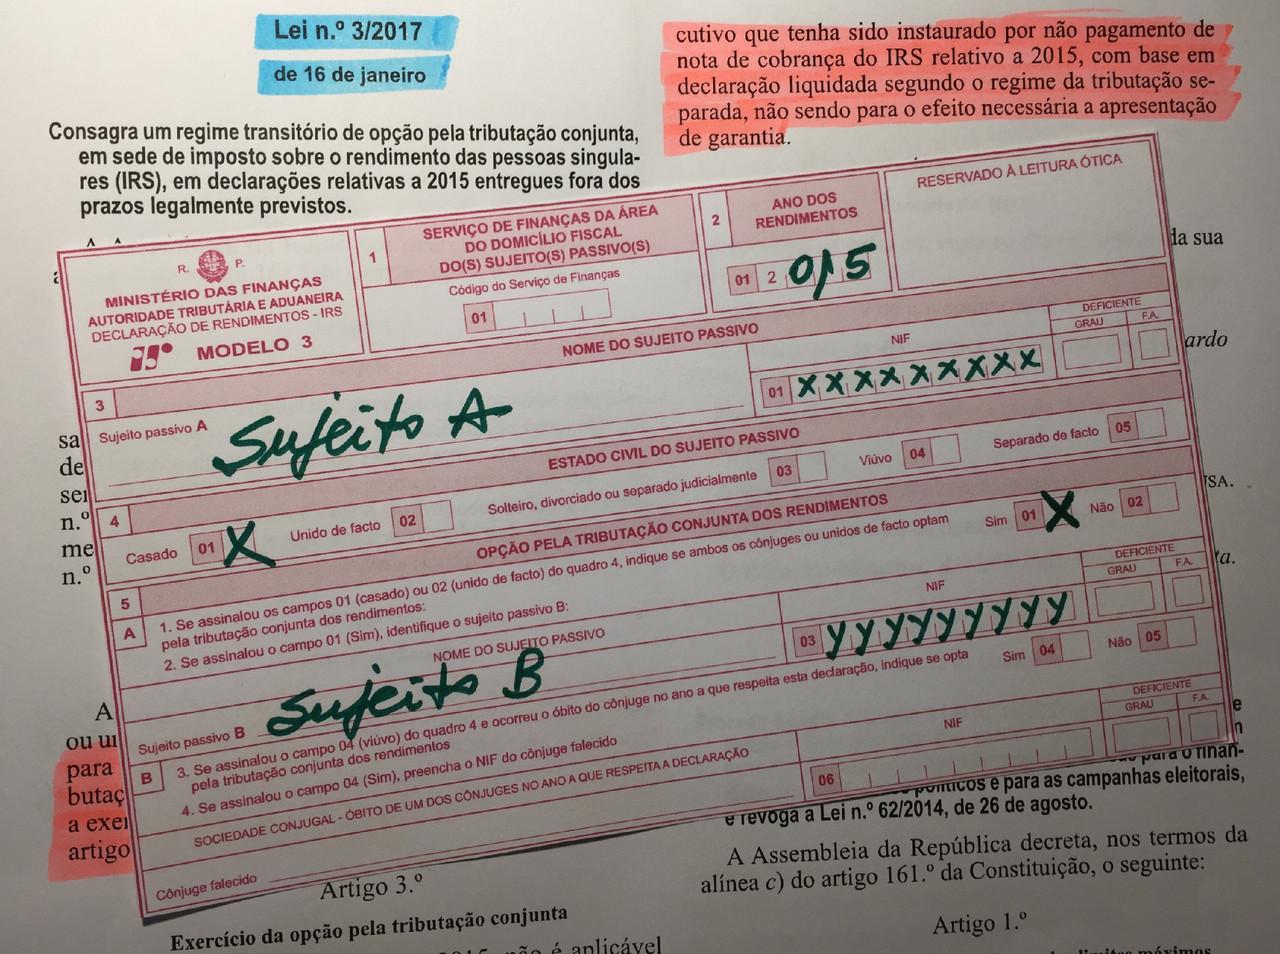 IRS 2015 tributação conjunta.jpg